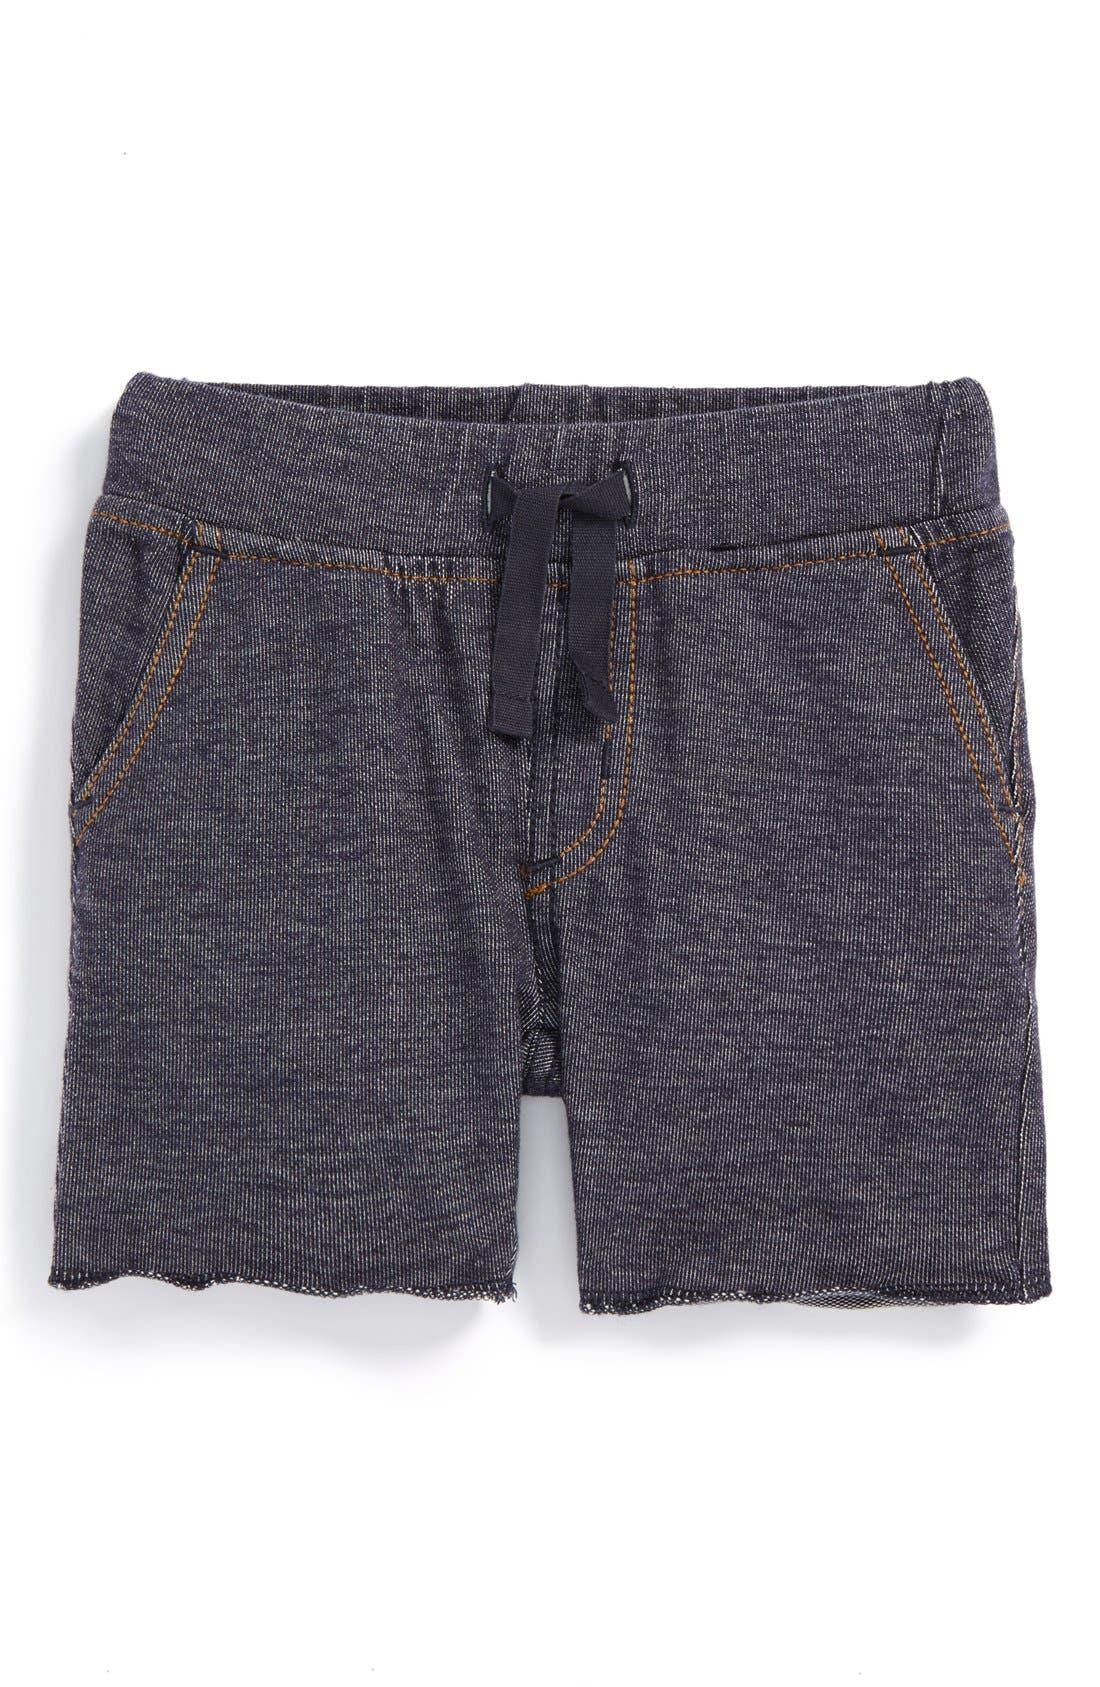 Denim Look Shorts,                         Main,                         color, Indigo